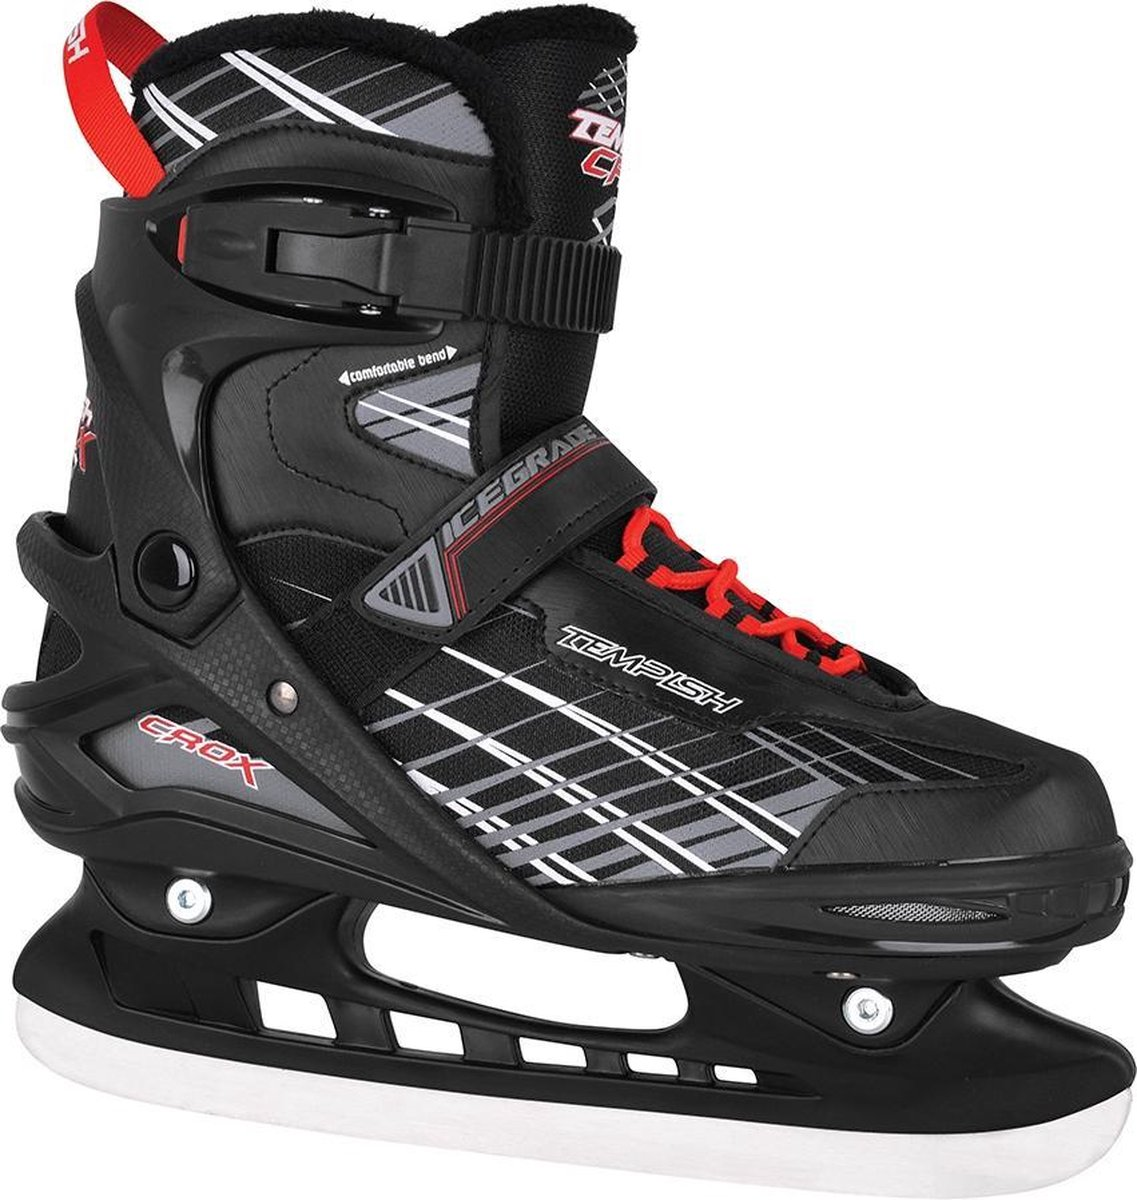 Tempish IJshockeyschaatsen CROX Zwart/Rood 43